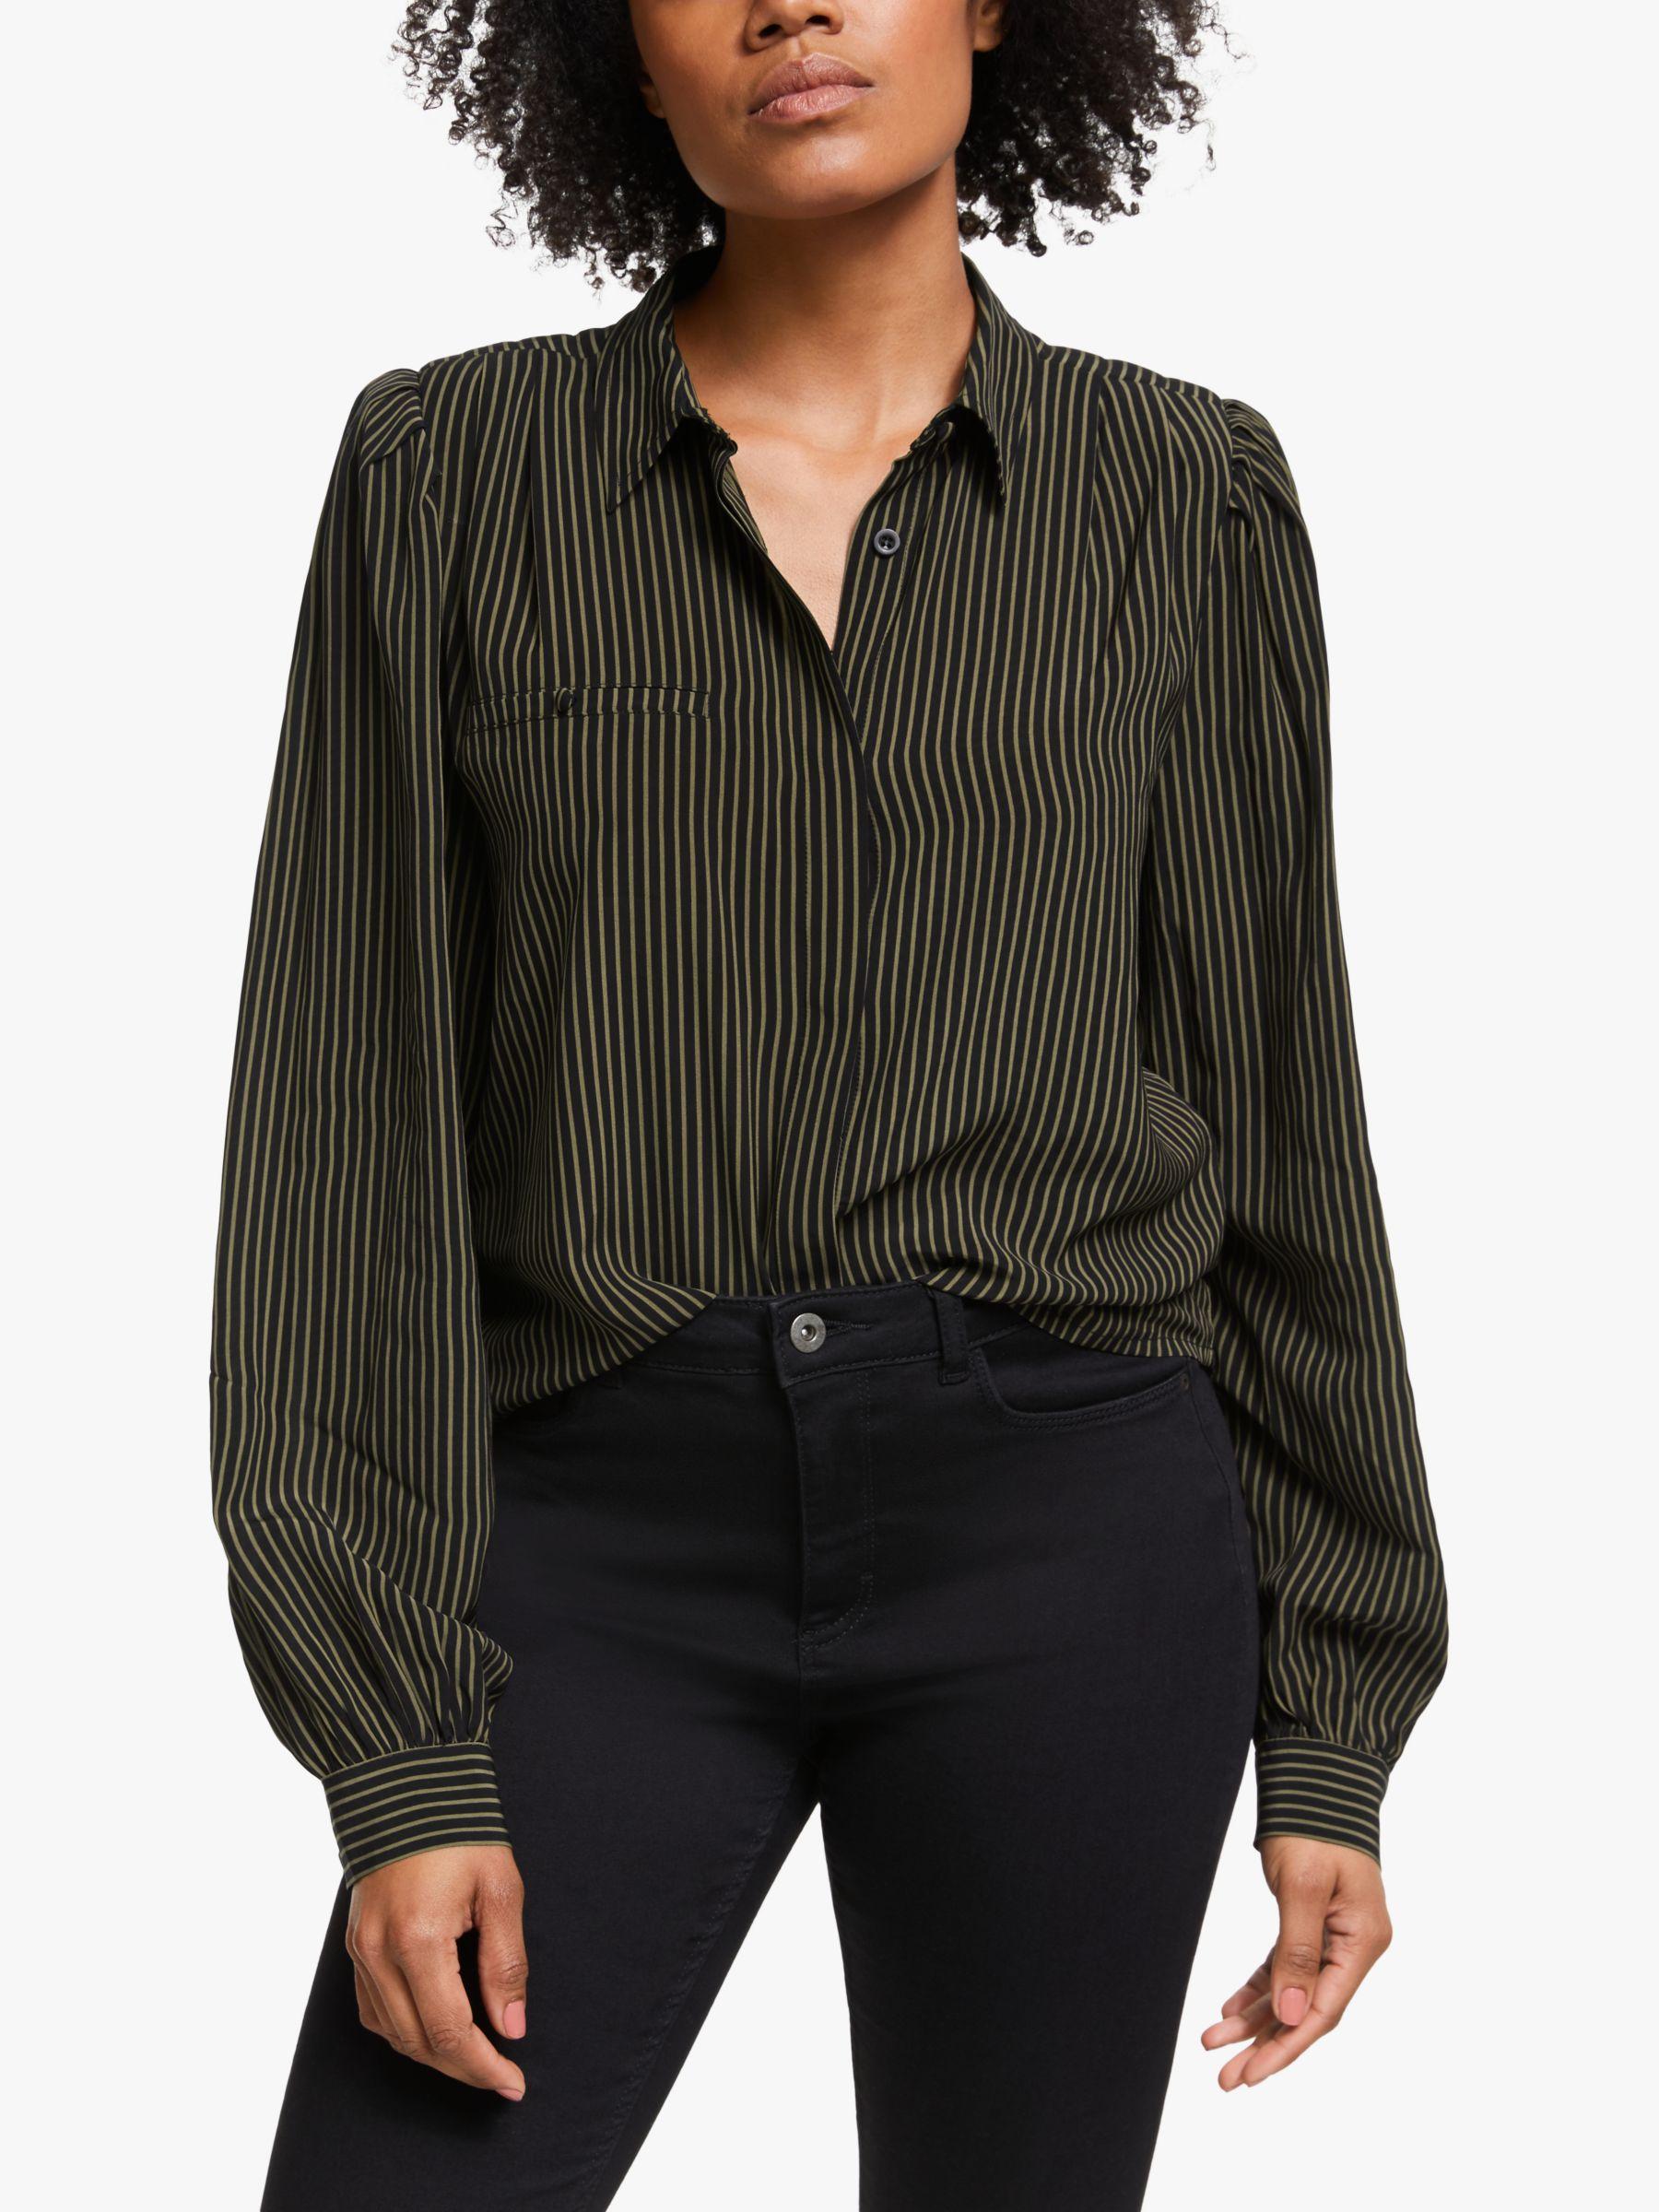 Gestuz Gestuz Levira Stripe Shirt, Black/Capers